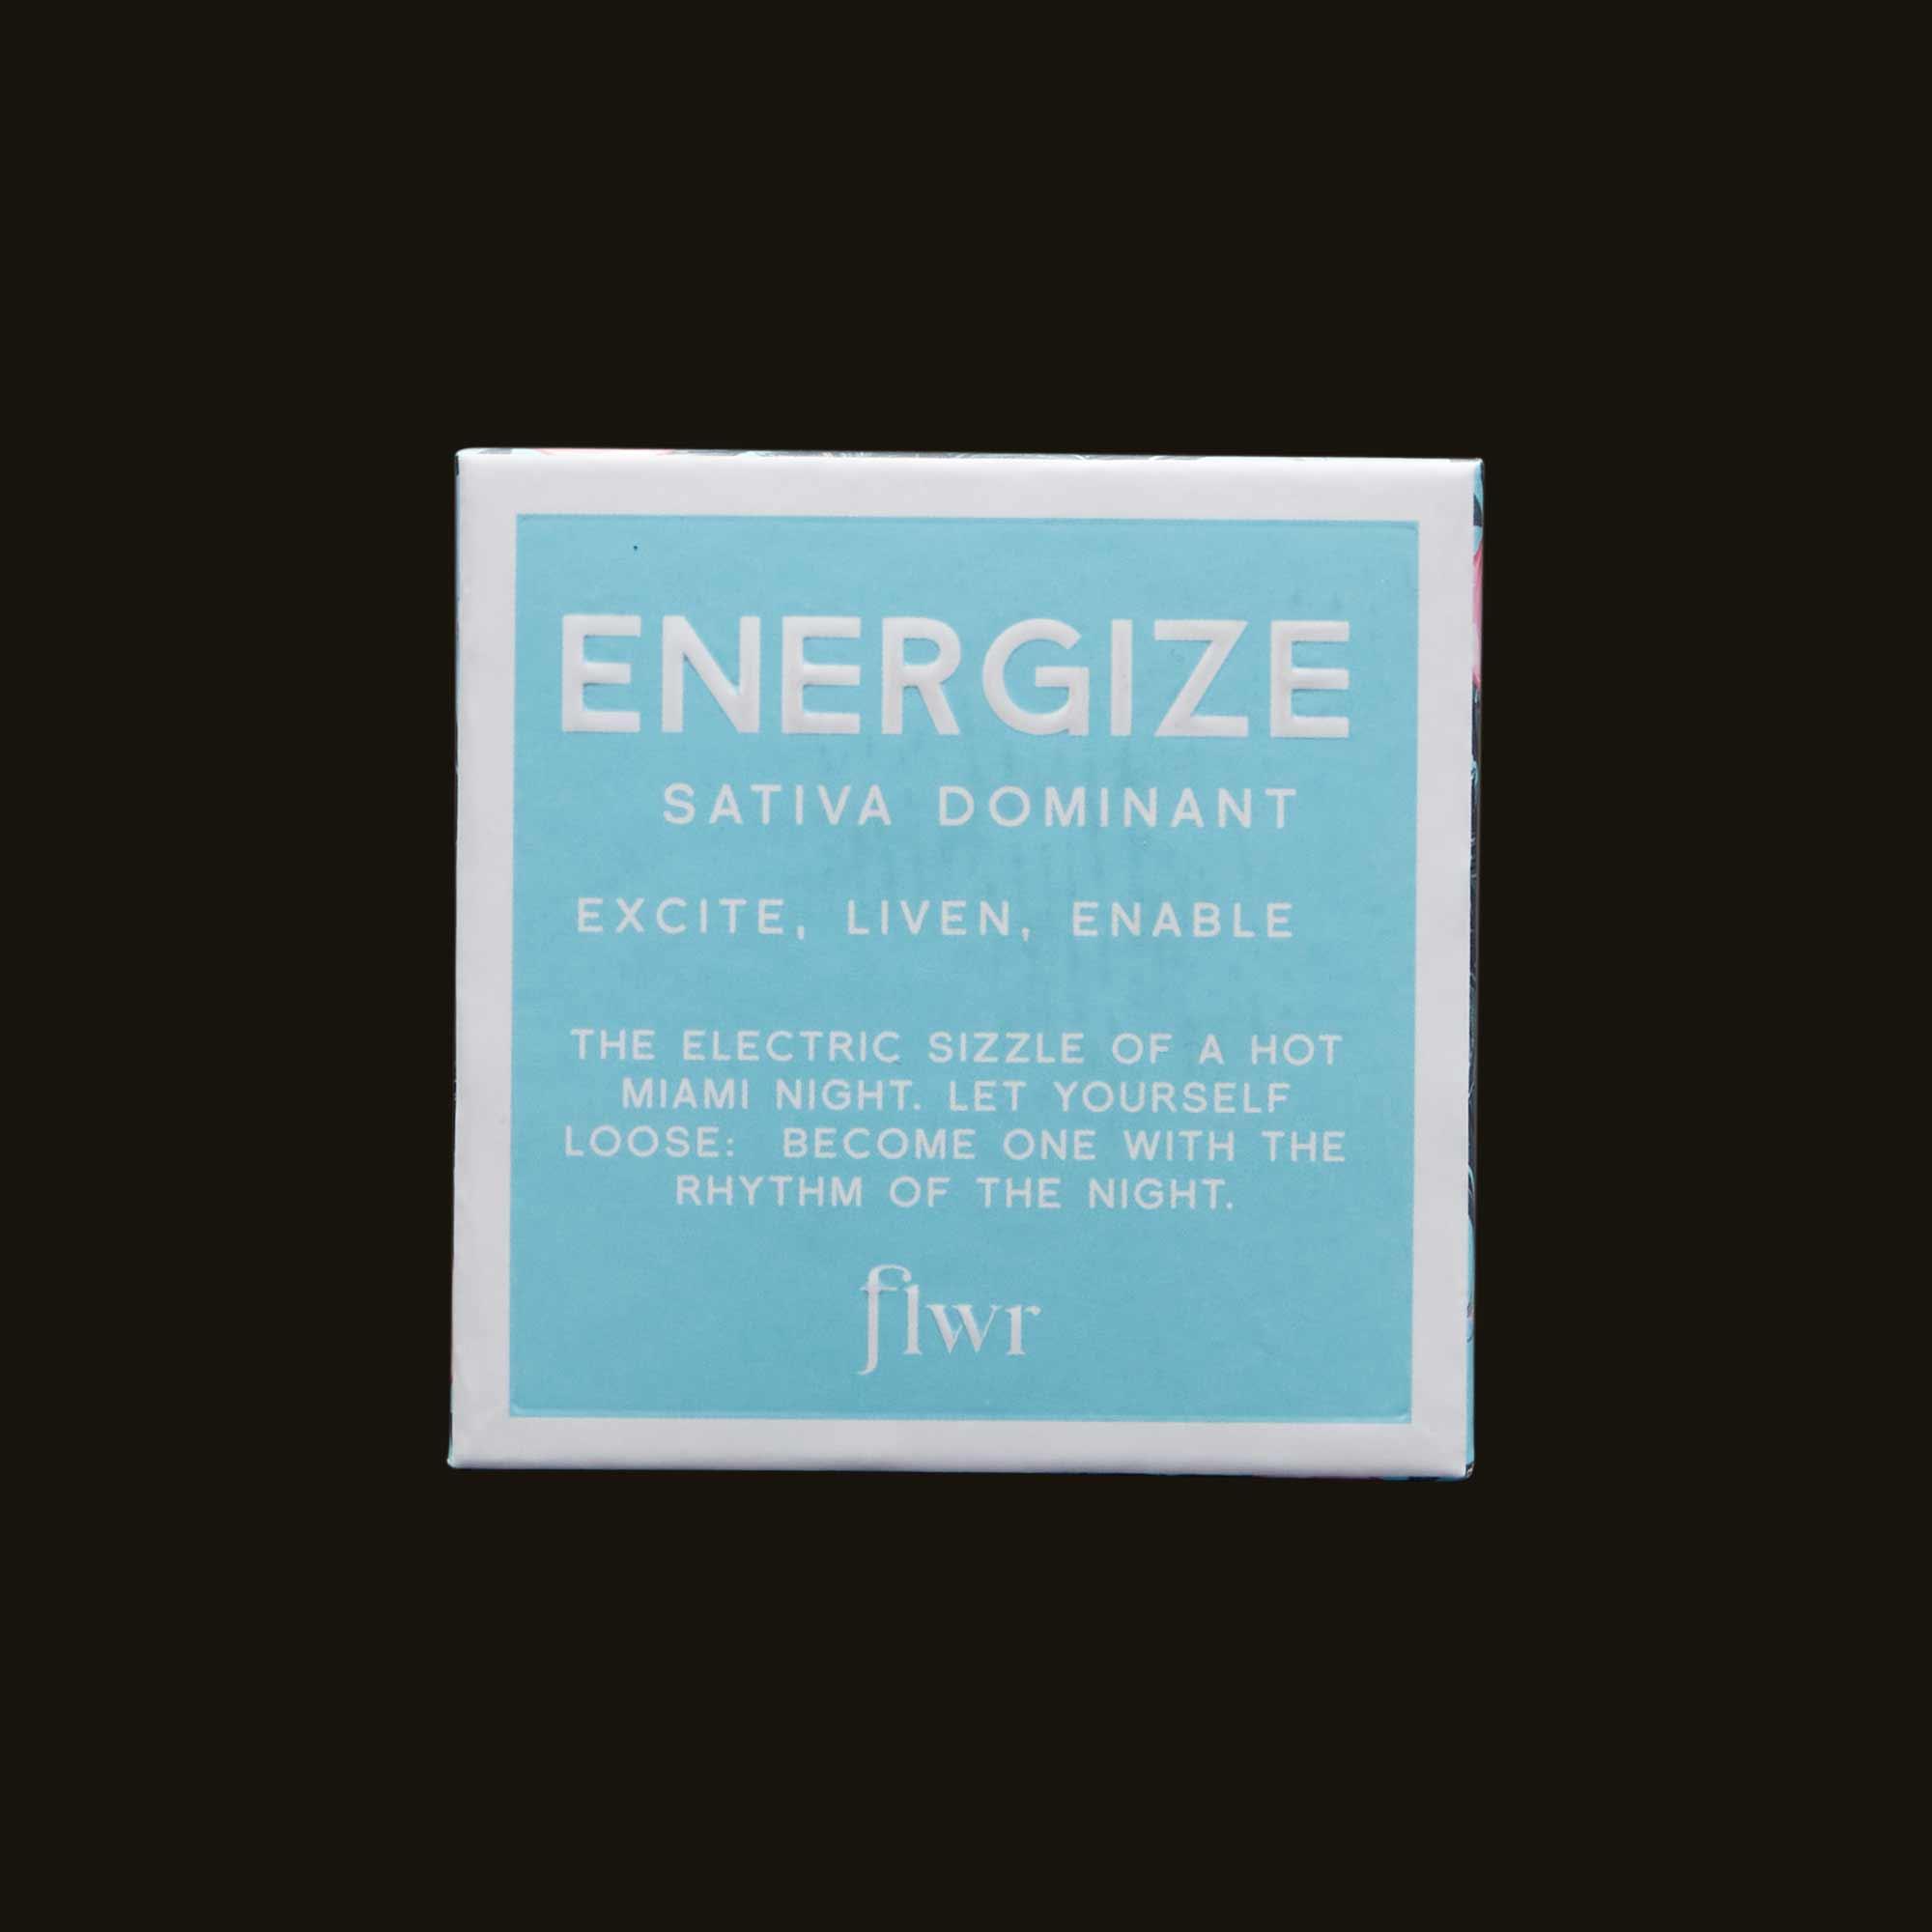 flwr Energize